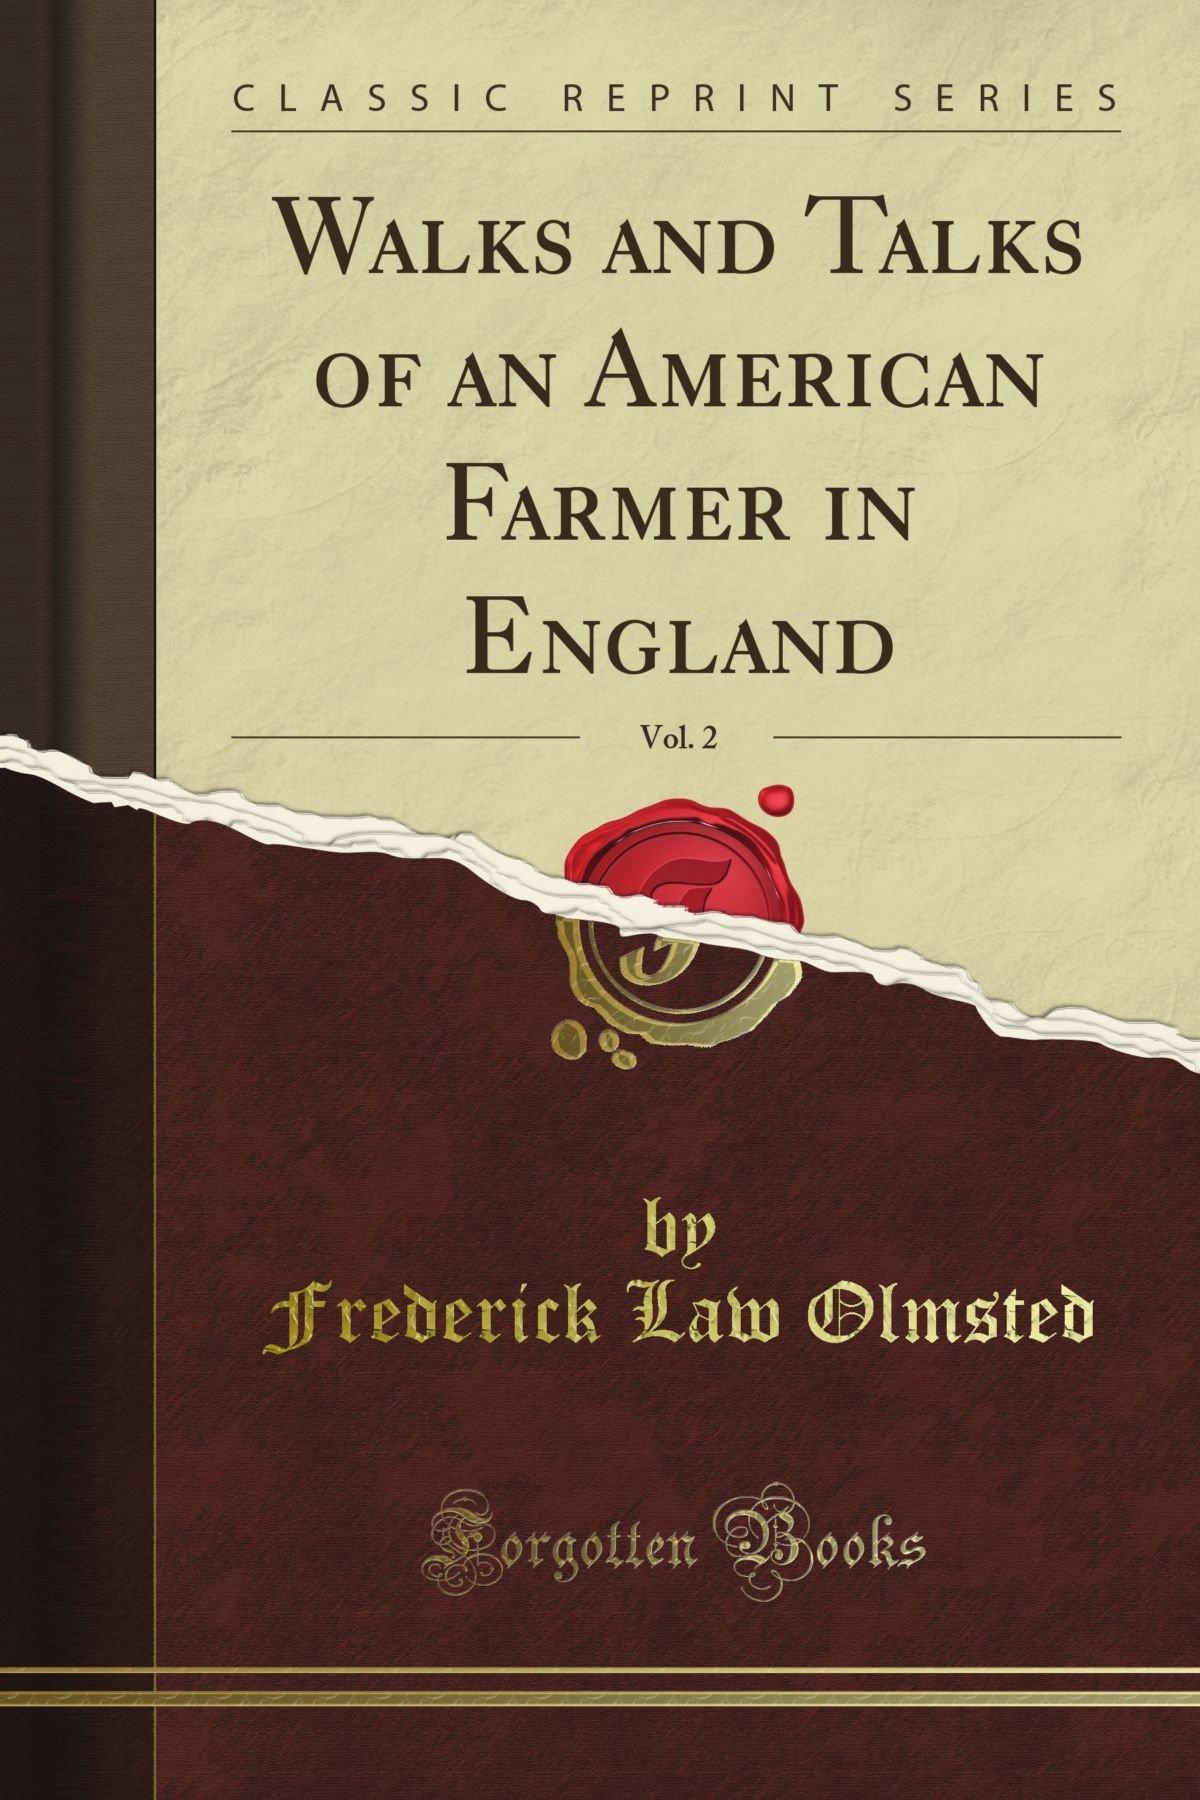 Walks and Talks of an American Farmer in England, Vol. 2 (Classic Reprint) ebook